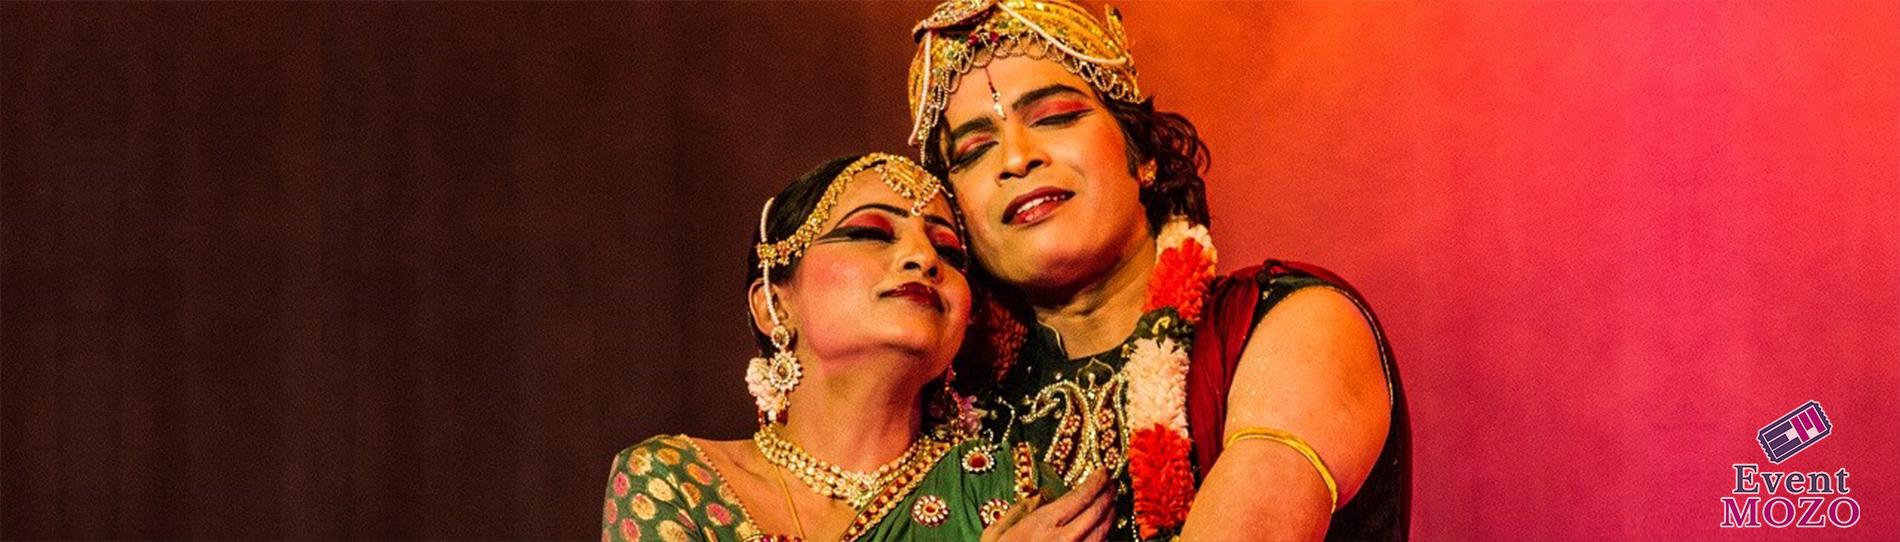 EventMozo Kathak Duet By Dr. Hari & Dr. Chethana